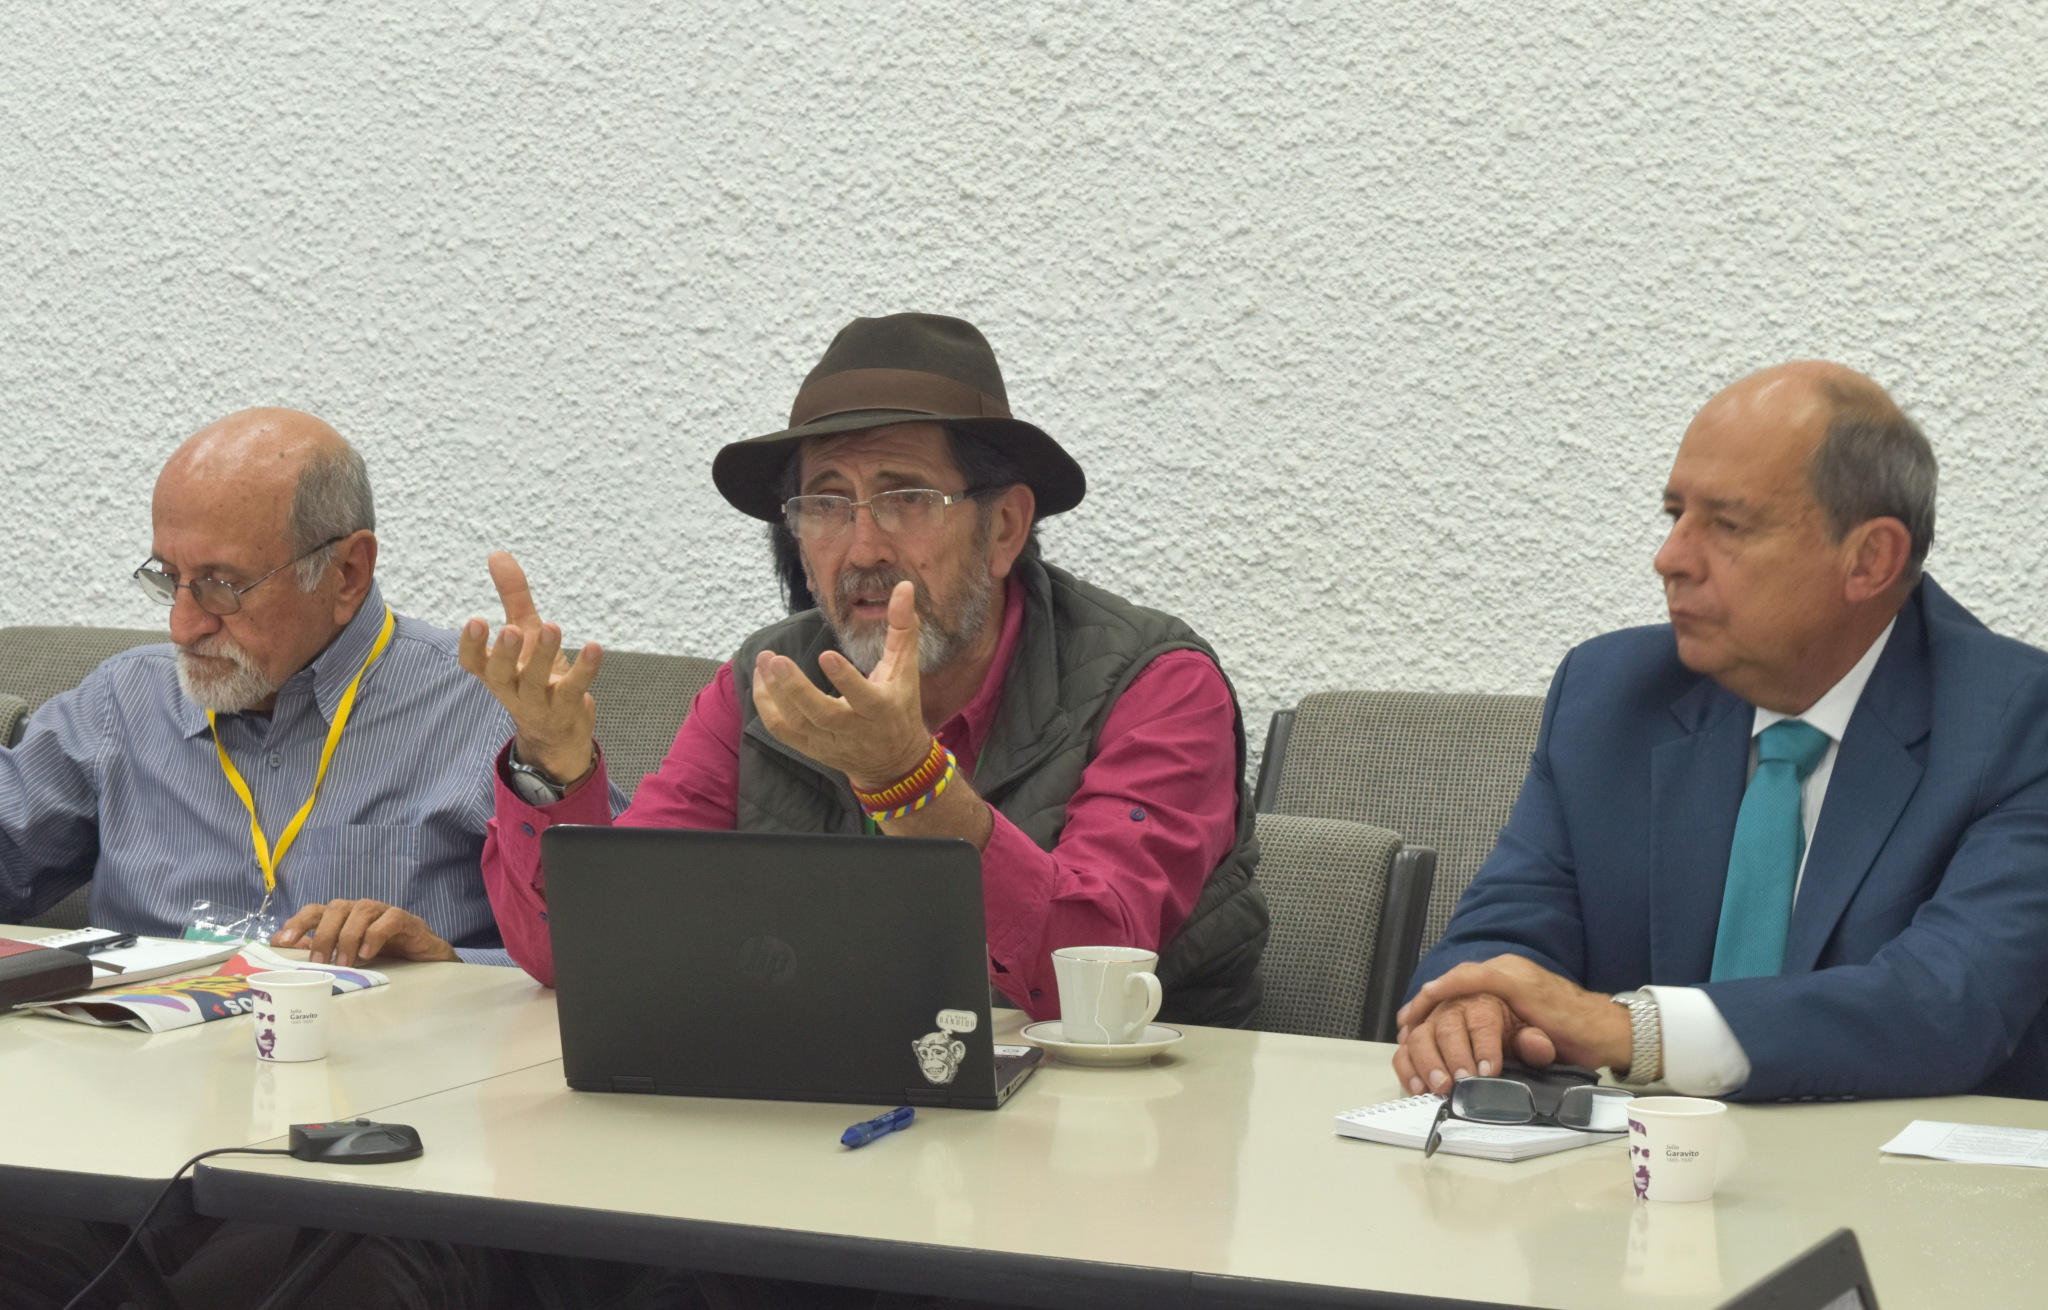 Foto: Laura Berrío/VRI